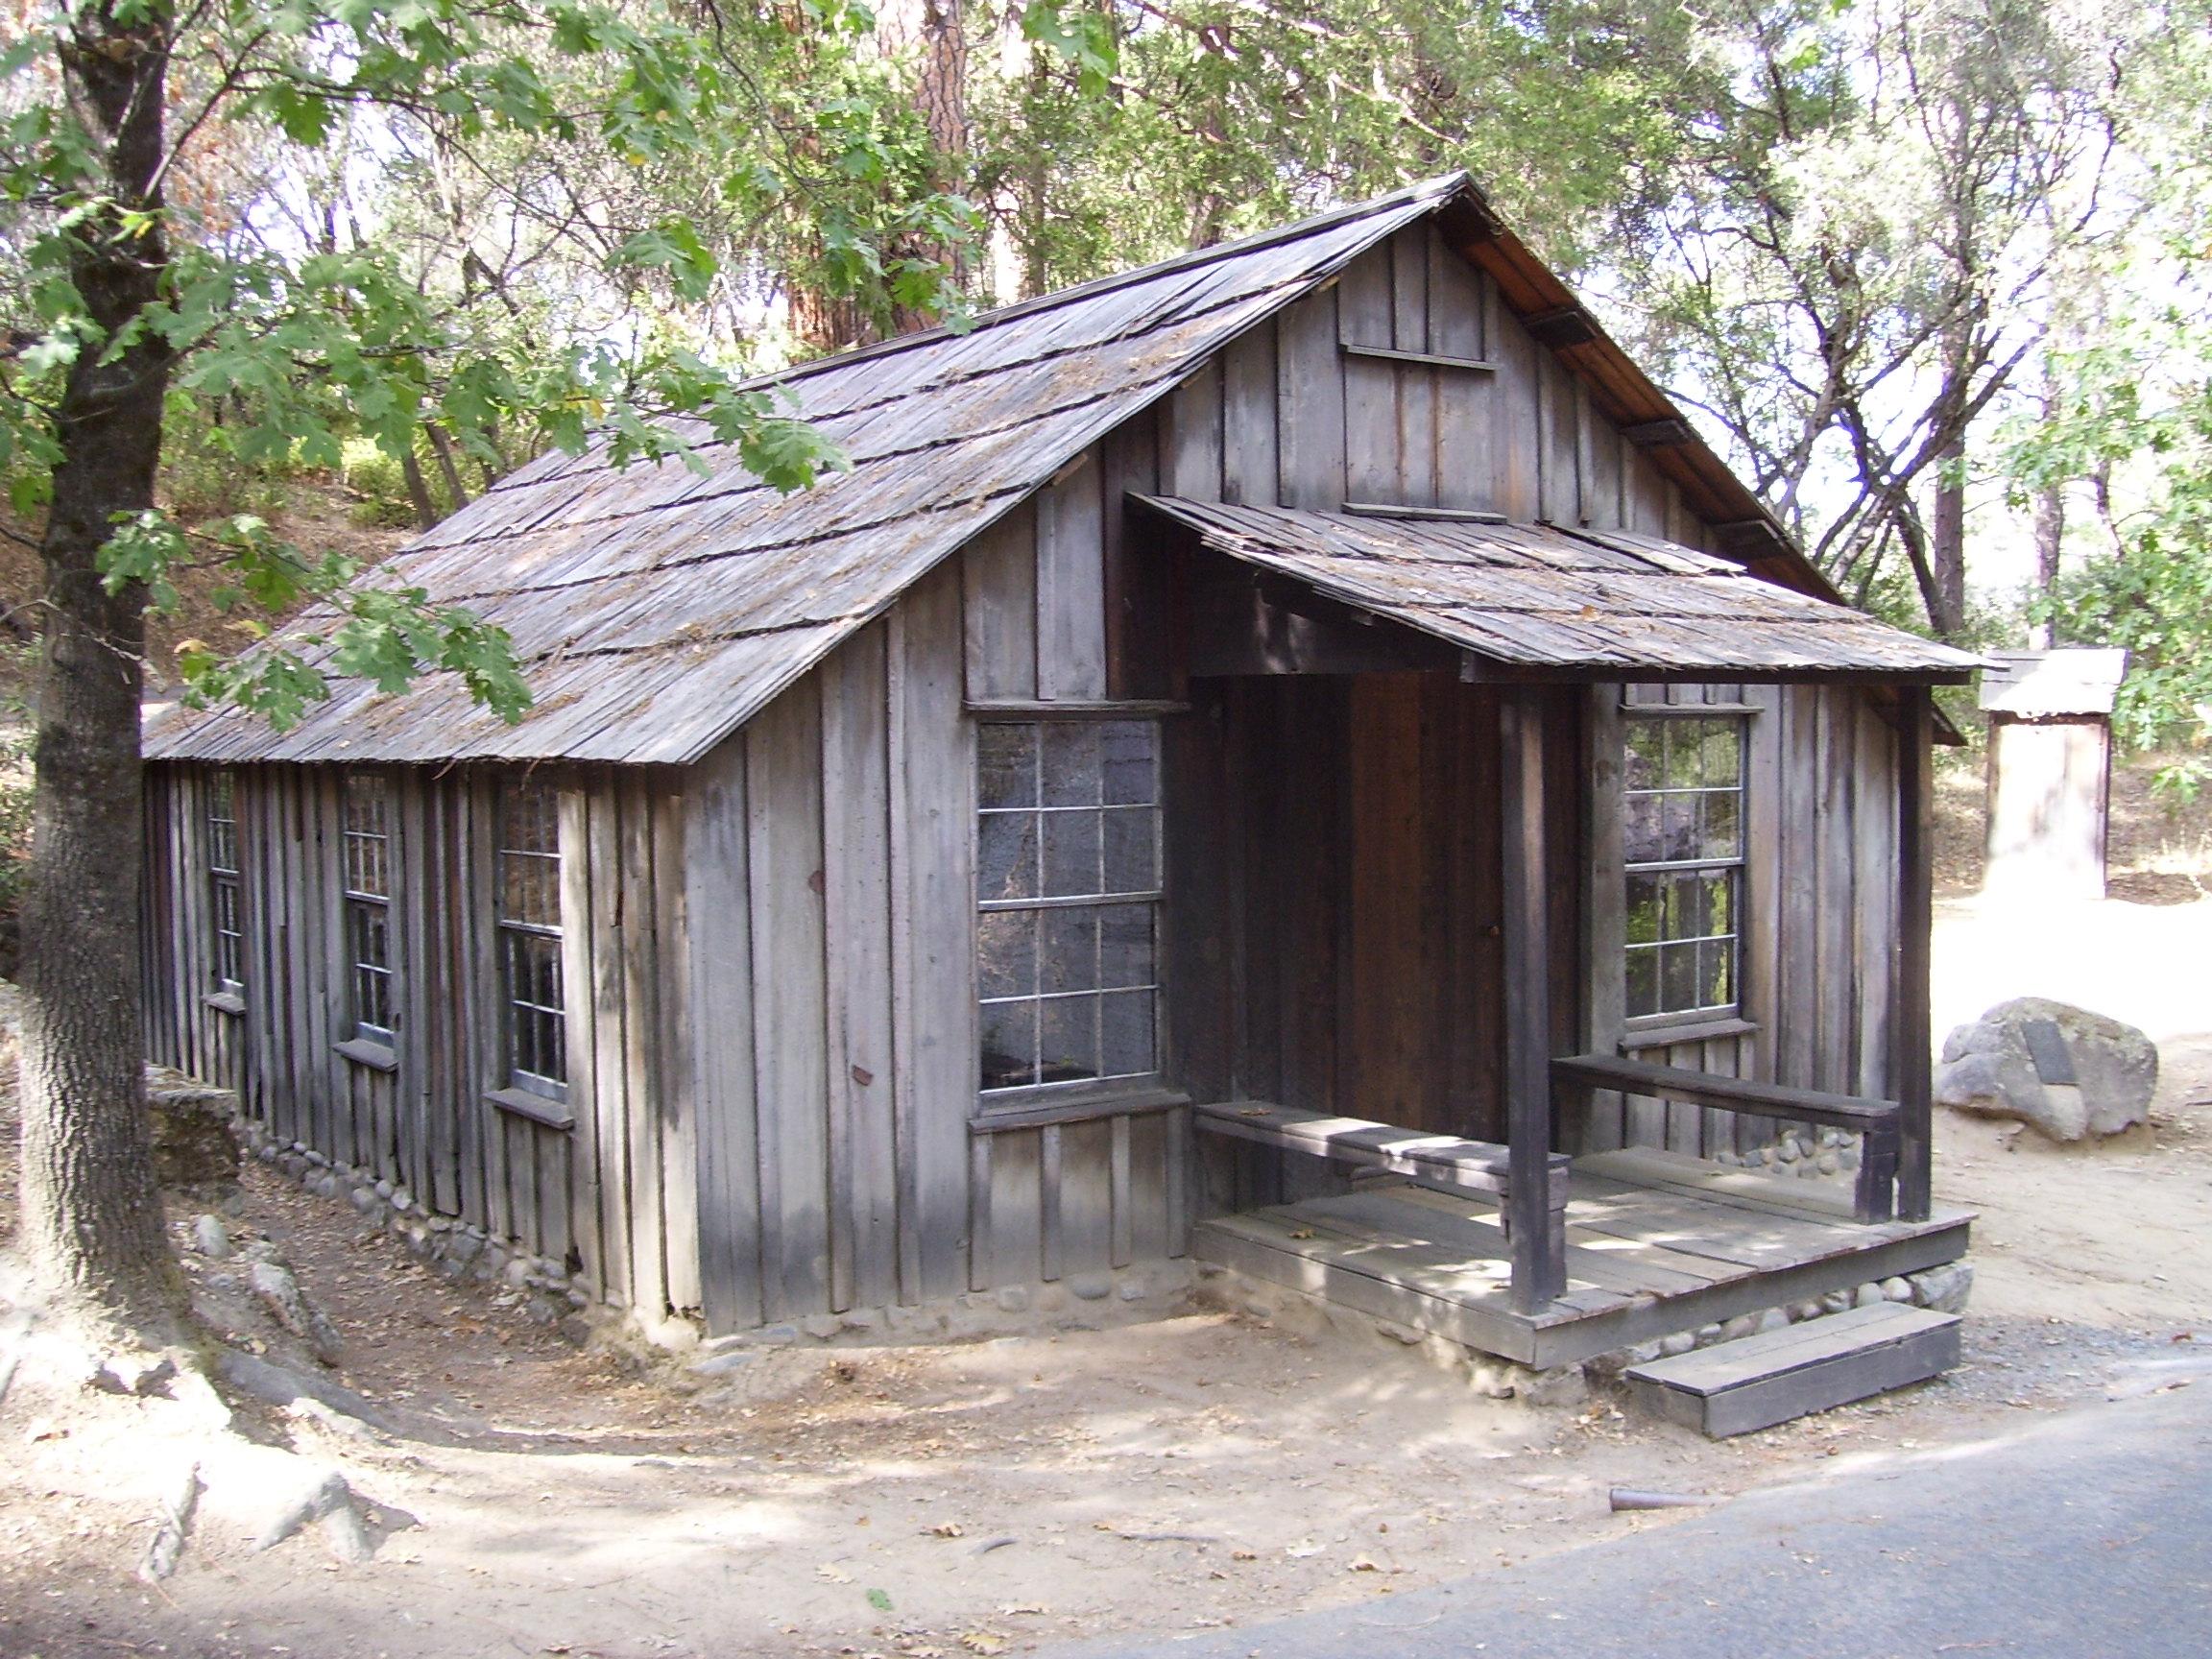 James_Marshall_cabin_in_Coloma_California_